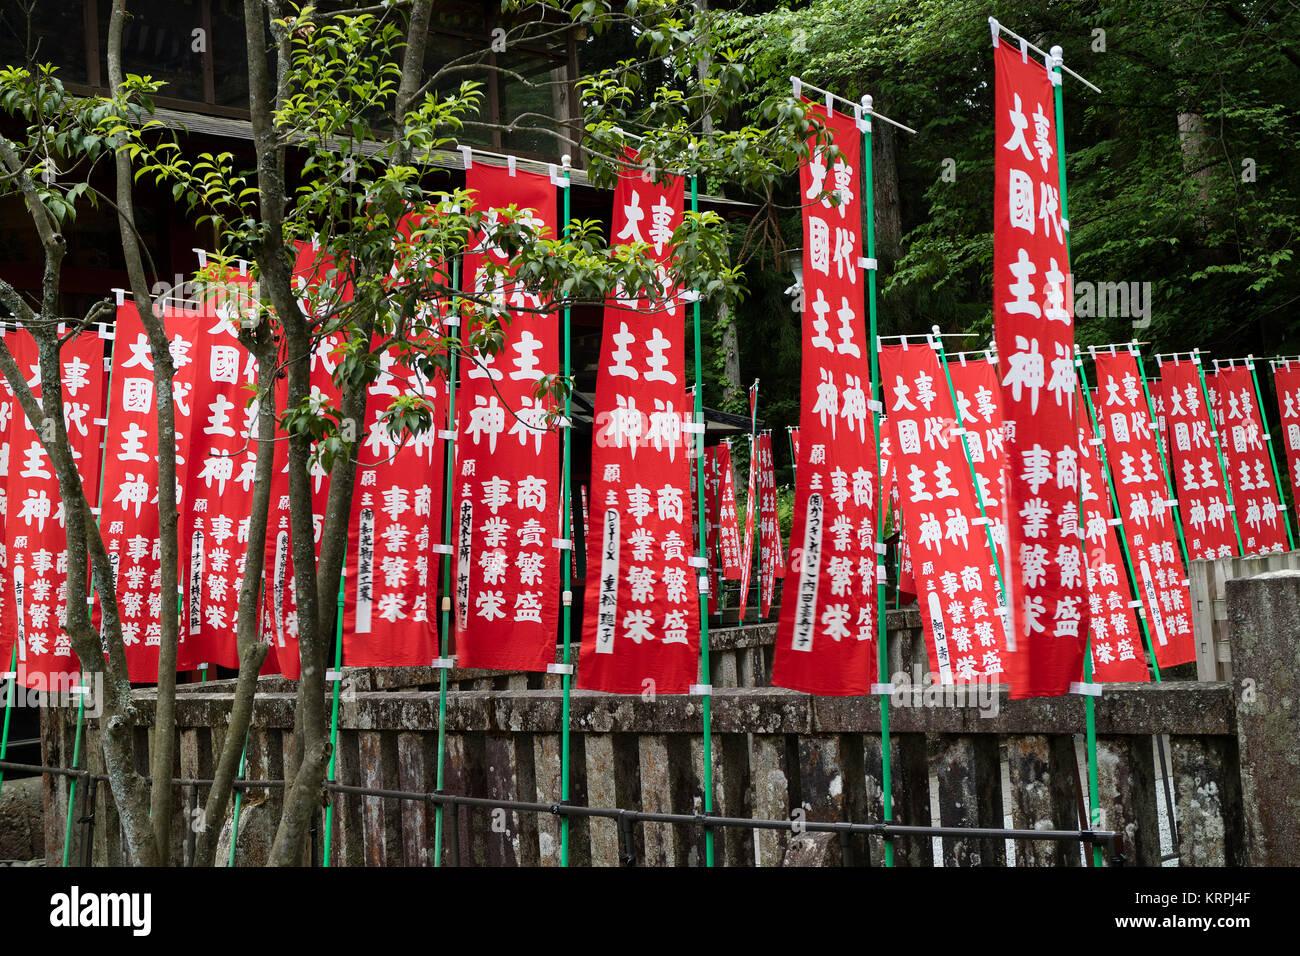 Fujiyoshida city - Japan, June 13, 2017: Red shrine banners at the Fujiyoshida Sengen Shrine in Fujiyoshida city - Stock Image